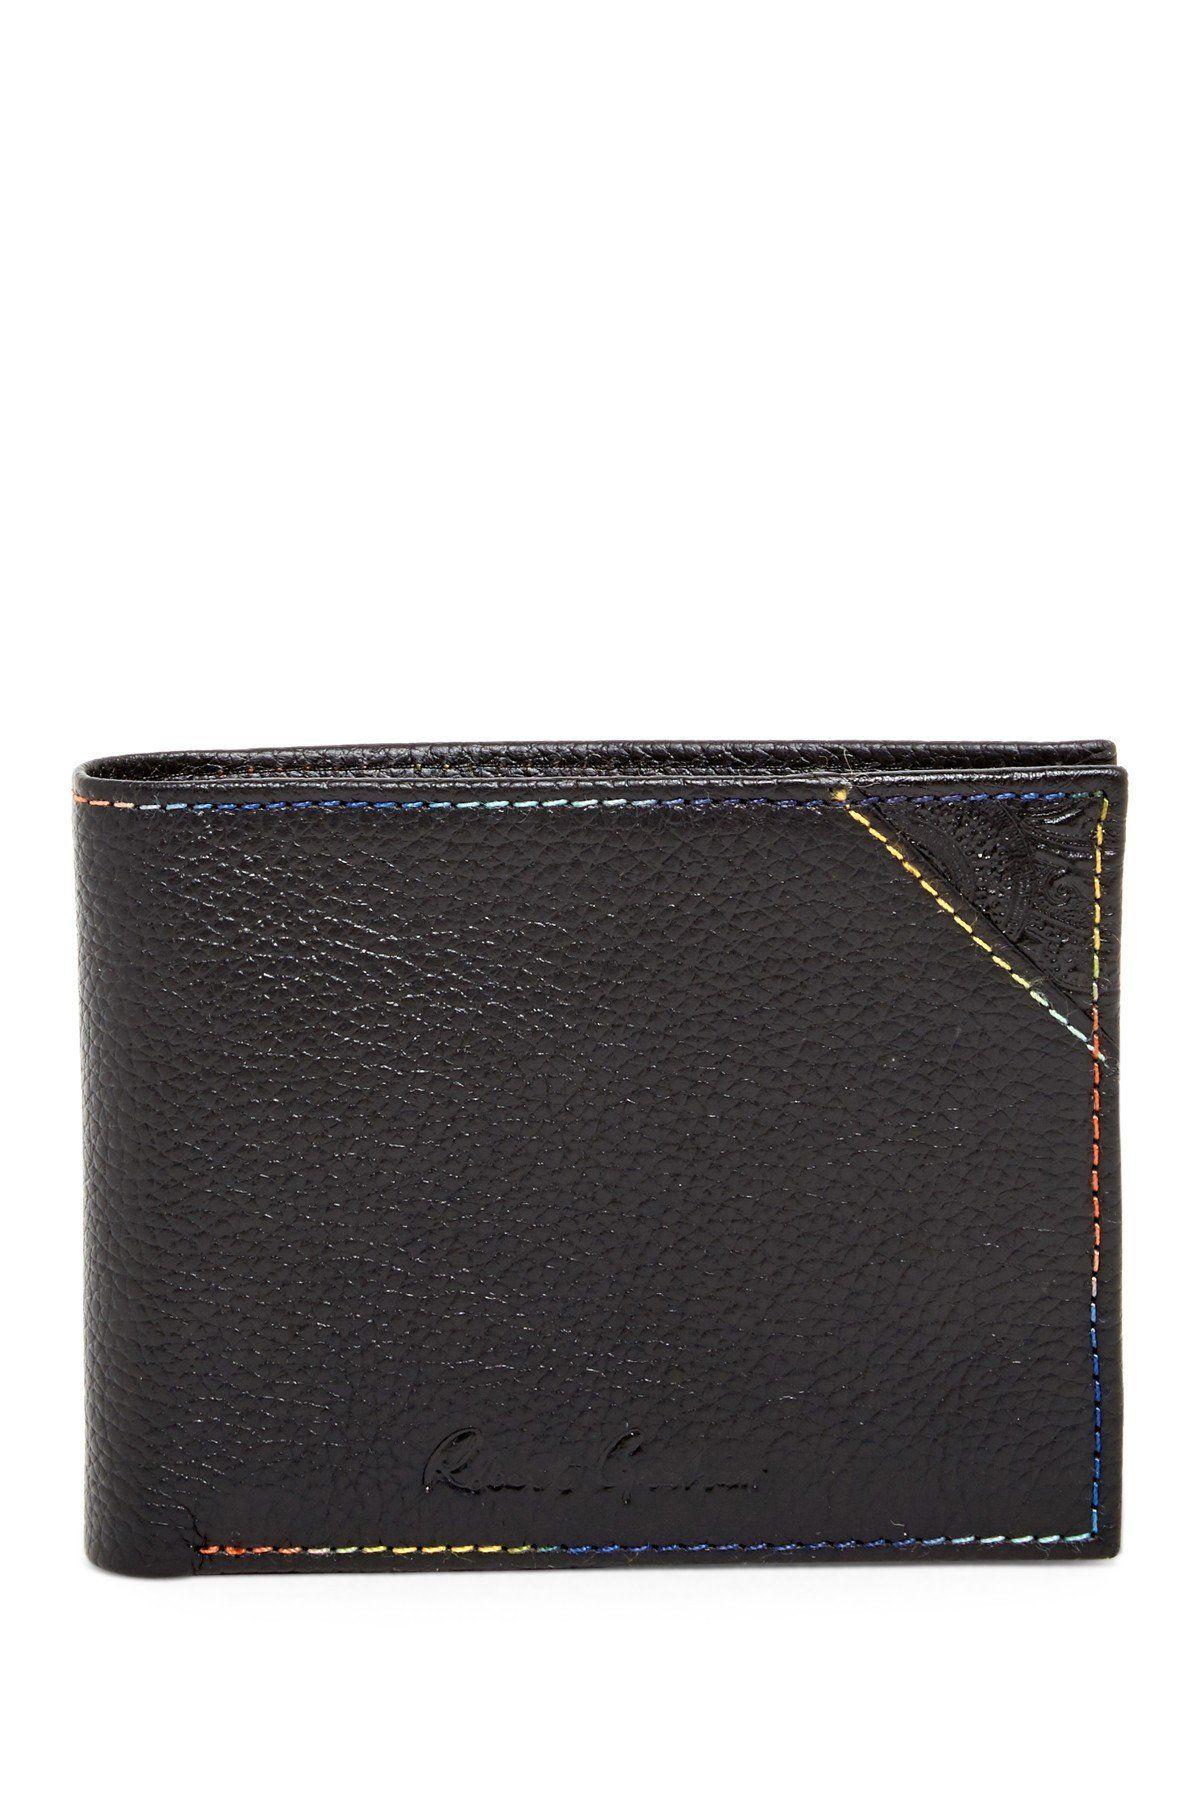 247c64de53 Prado Leather Bifold Wallet   Products   Leather bifold wallet ...